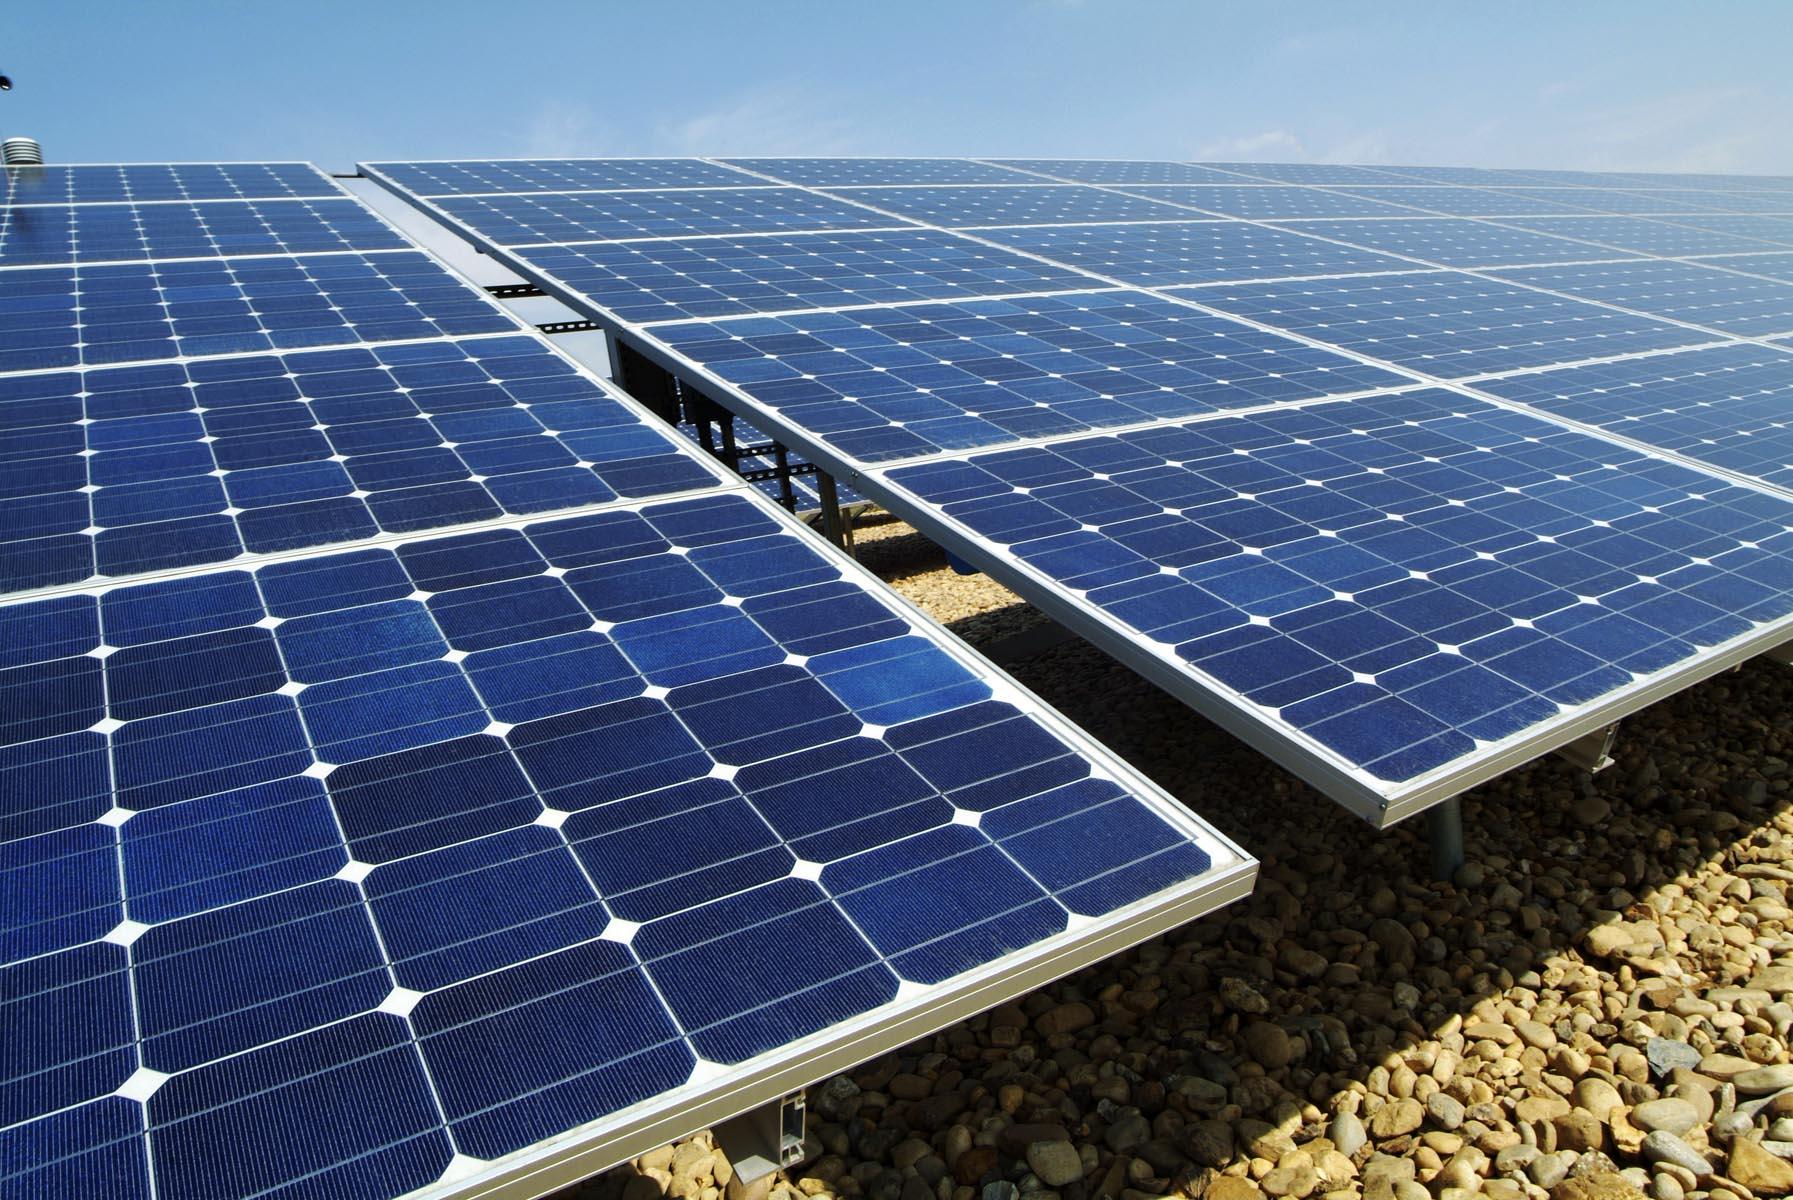 conceptual framework pf solar panel using heat